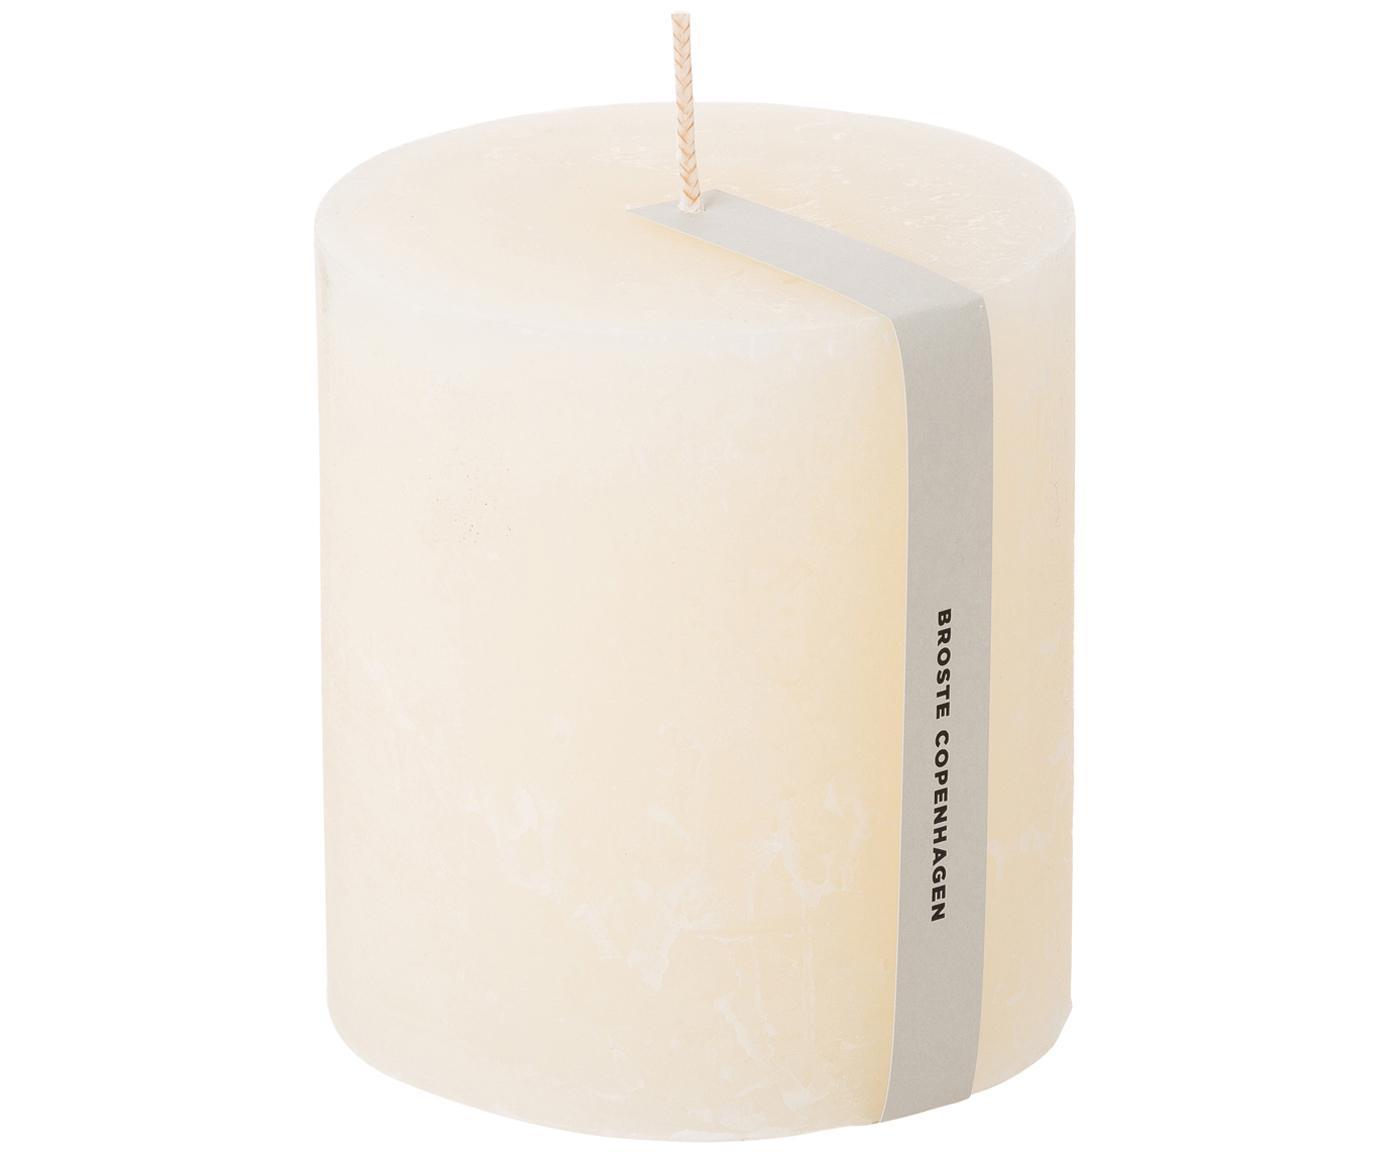 Candela decorativa bianca Rustic, Paraffina, Bianco, Ø 10 x Alt. 11 cm